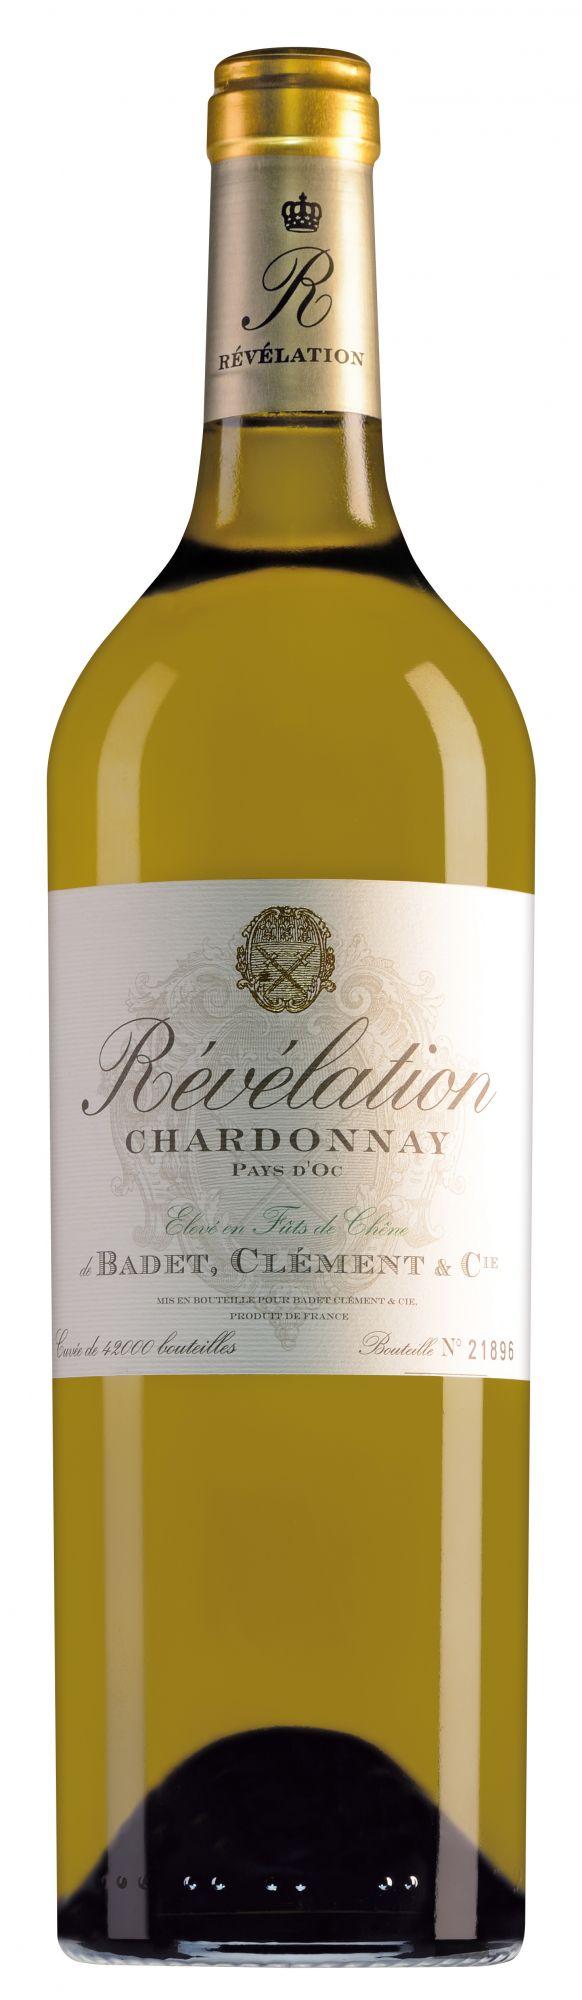 Révélation Pays d'Oc Chardonnay met schroefdop